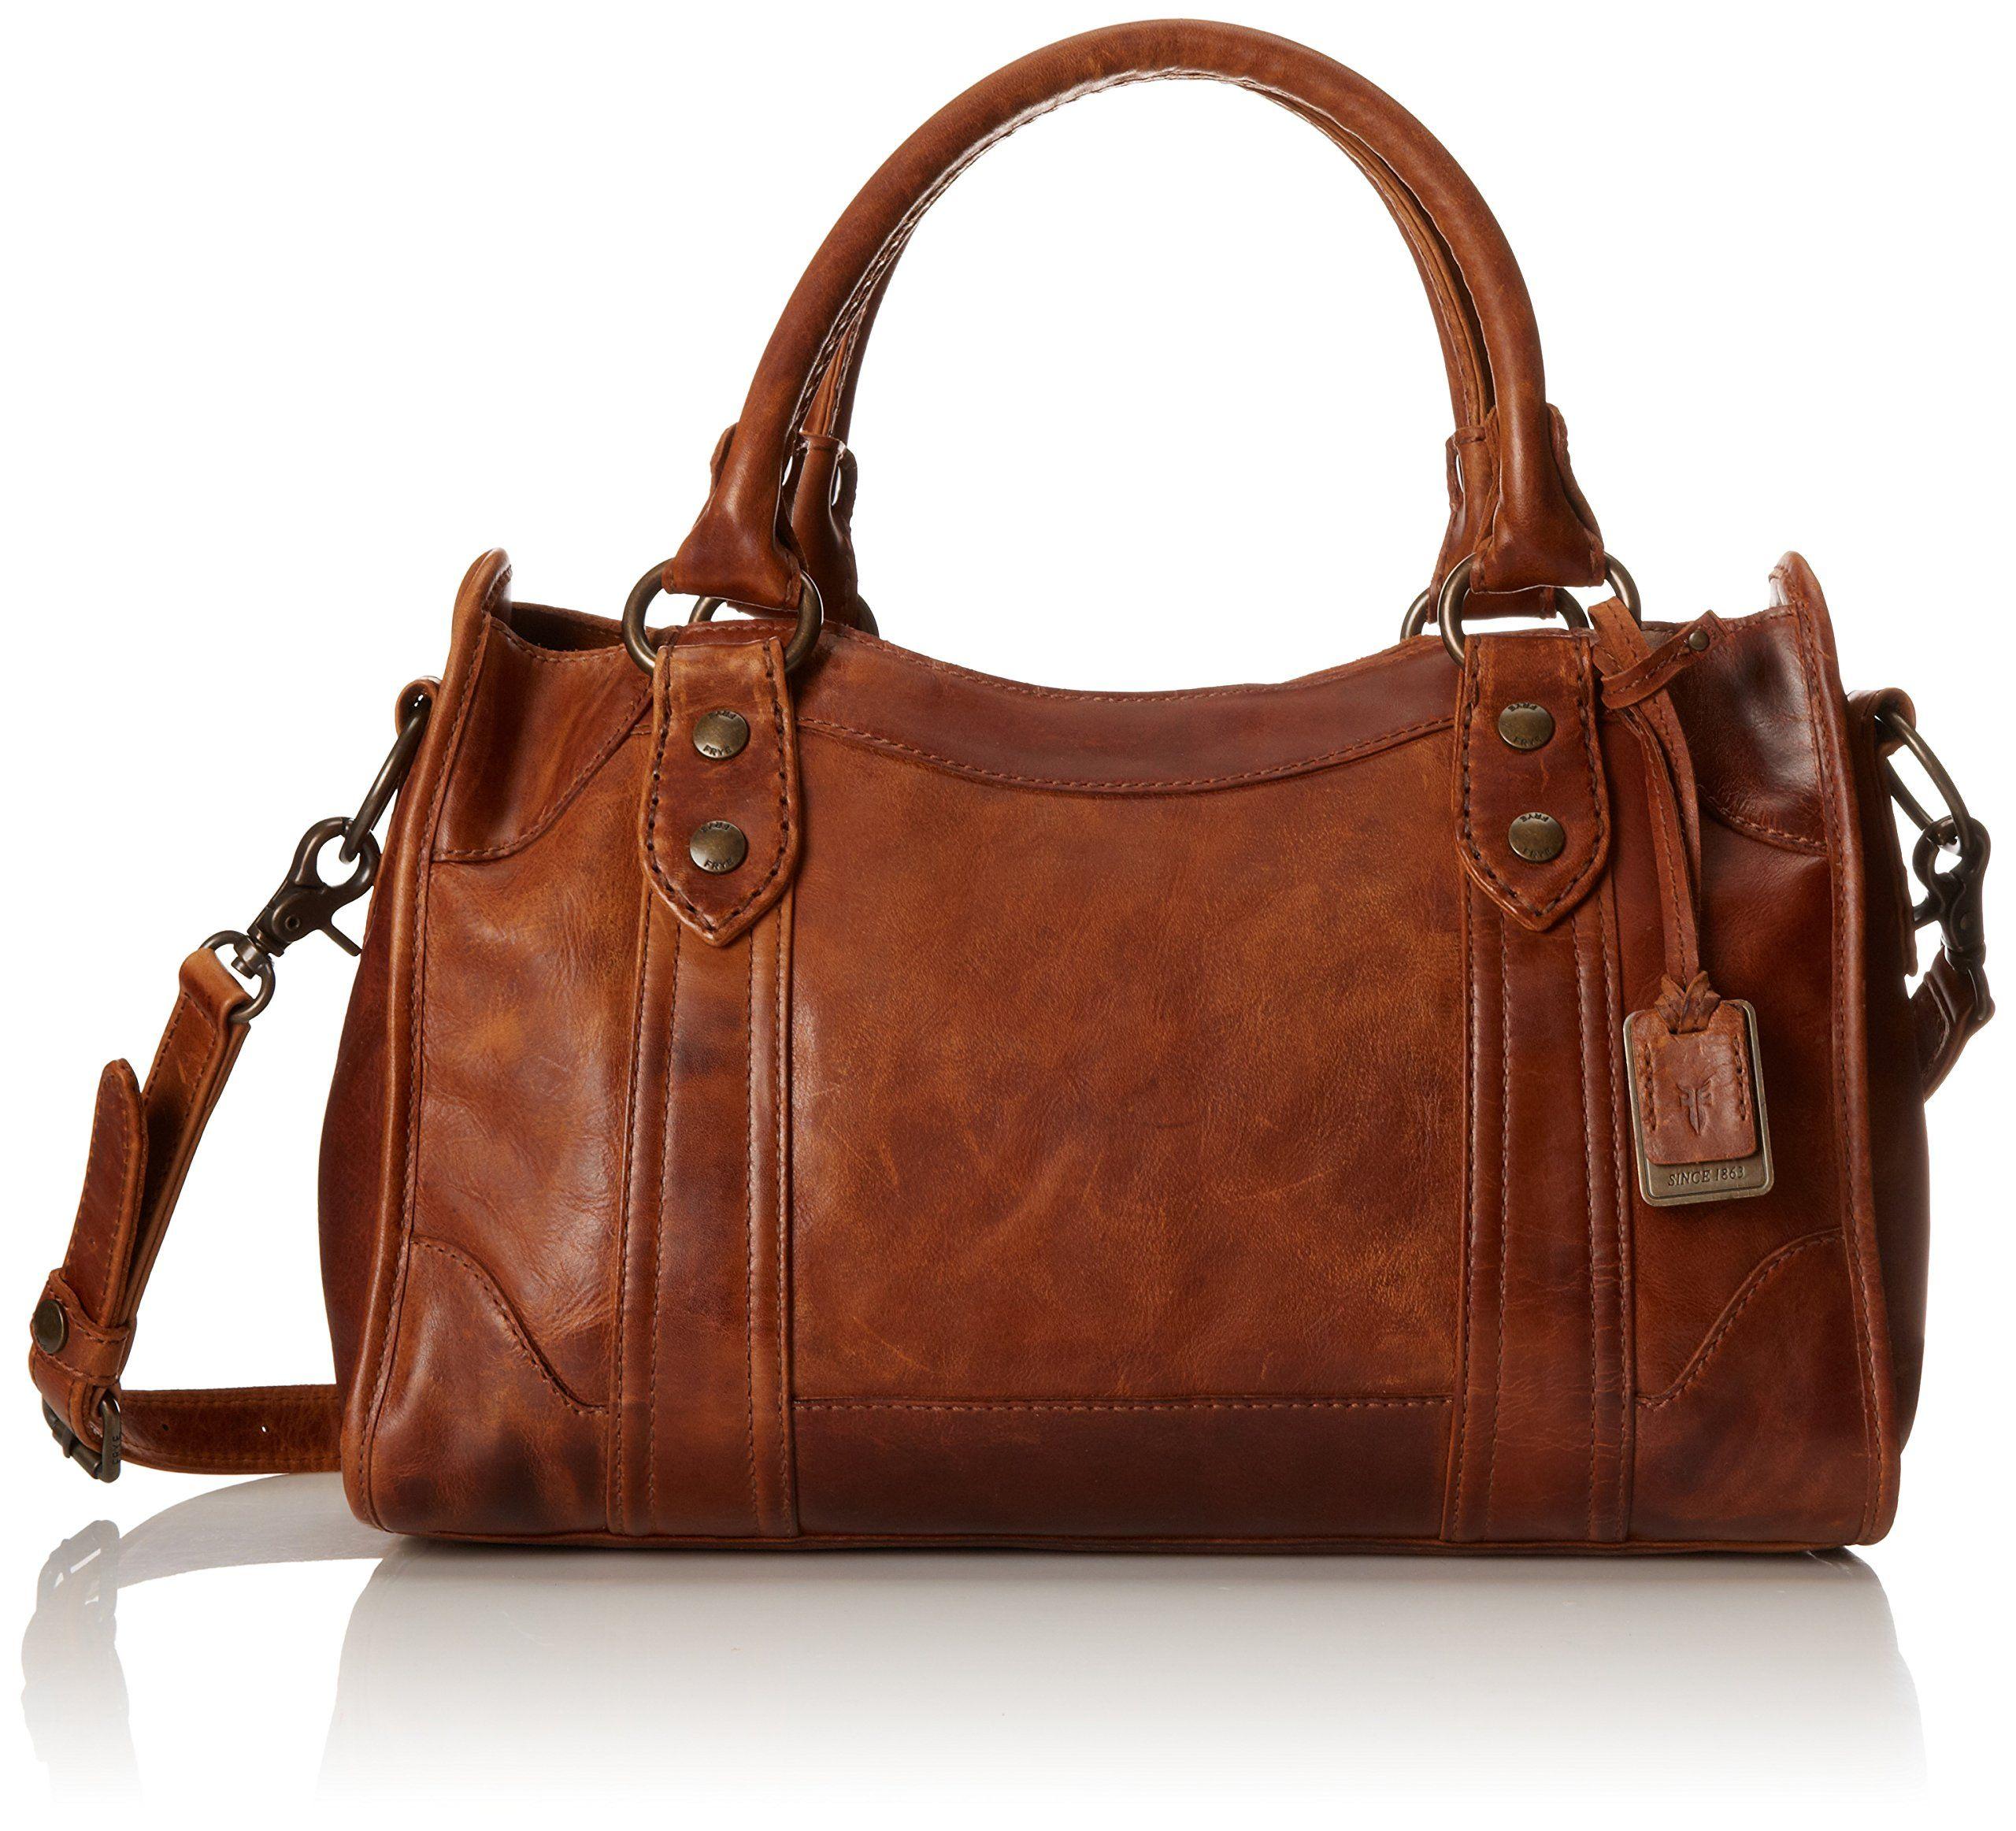 Frye Melissa Satchel Handbag Cognac